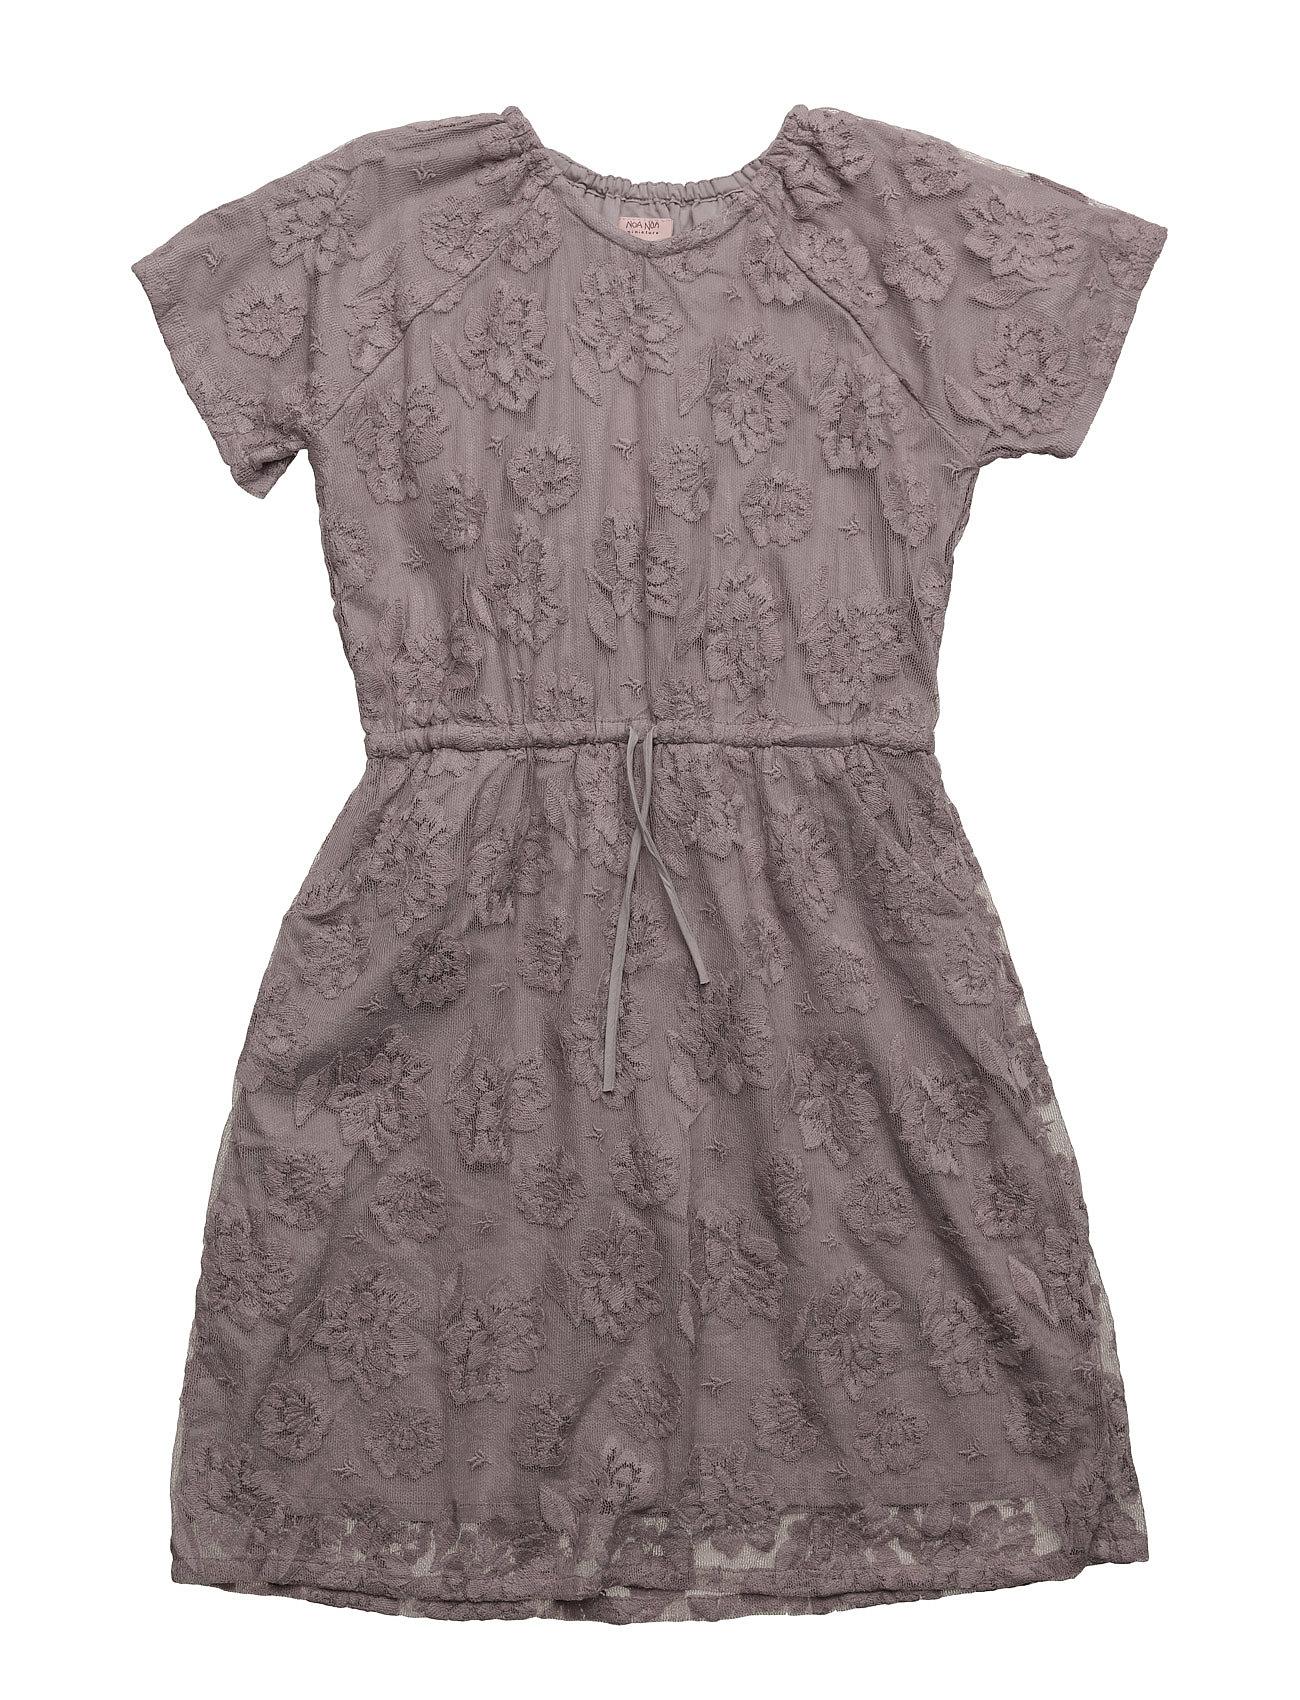 a6ab35e30b0 Dress Short Sleeve Noa Noa Miniature Kjoler til Børn i ...